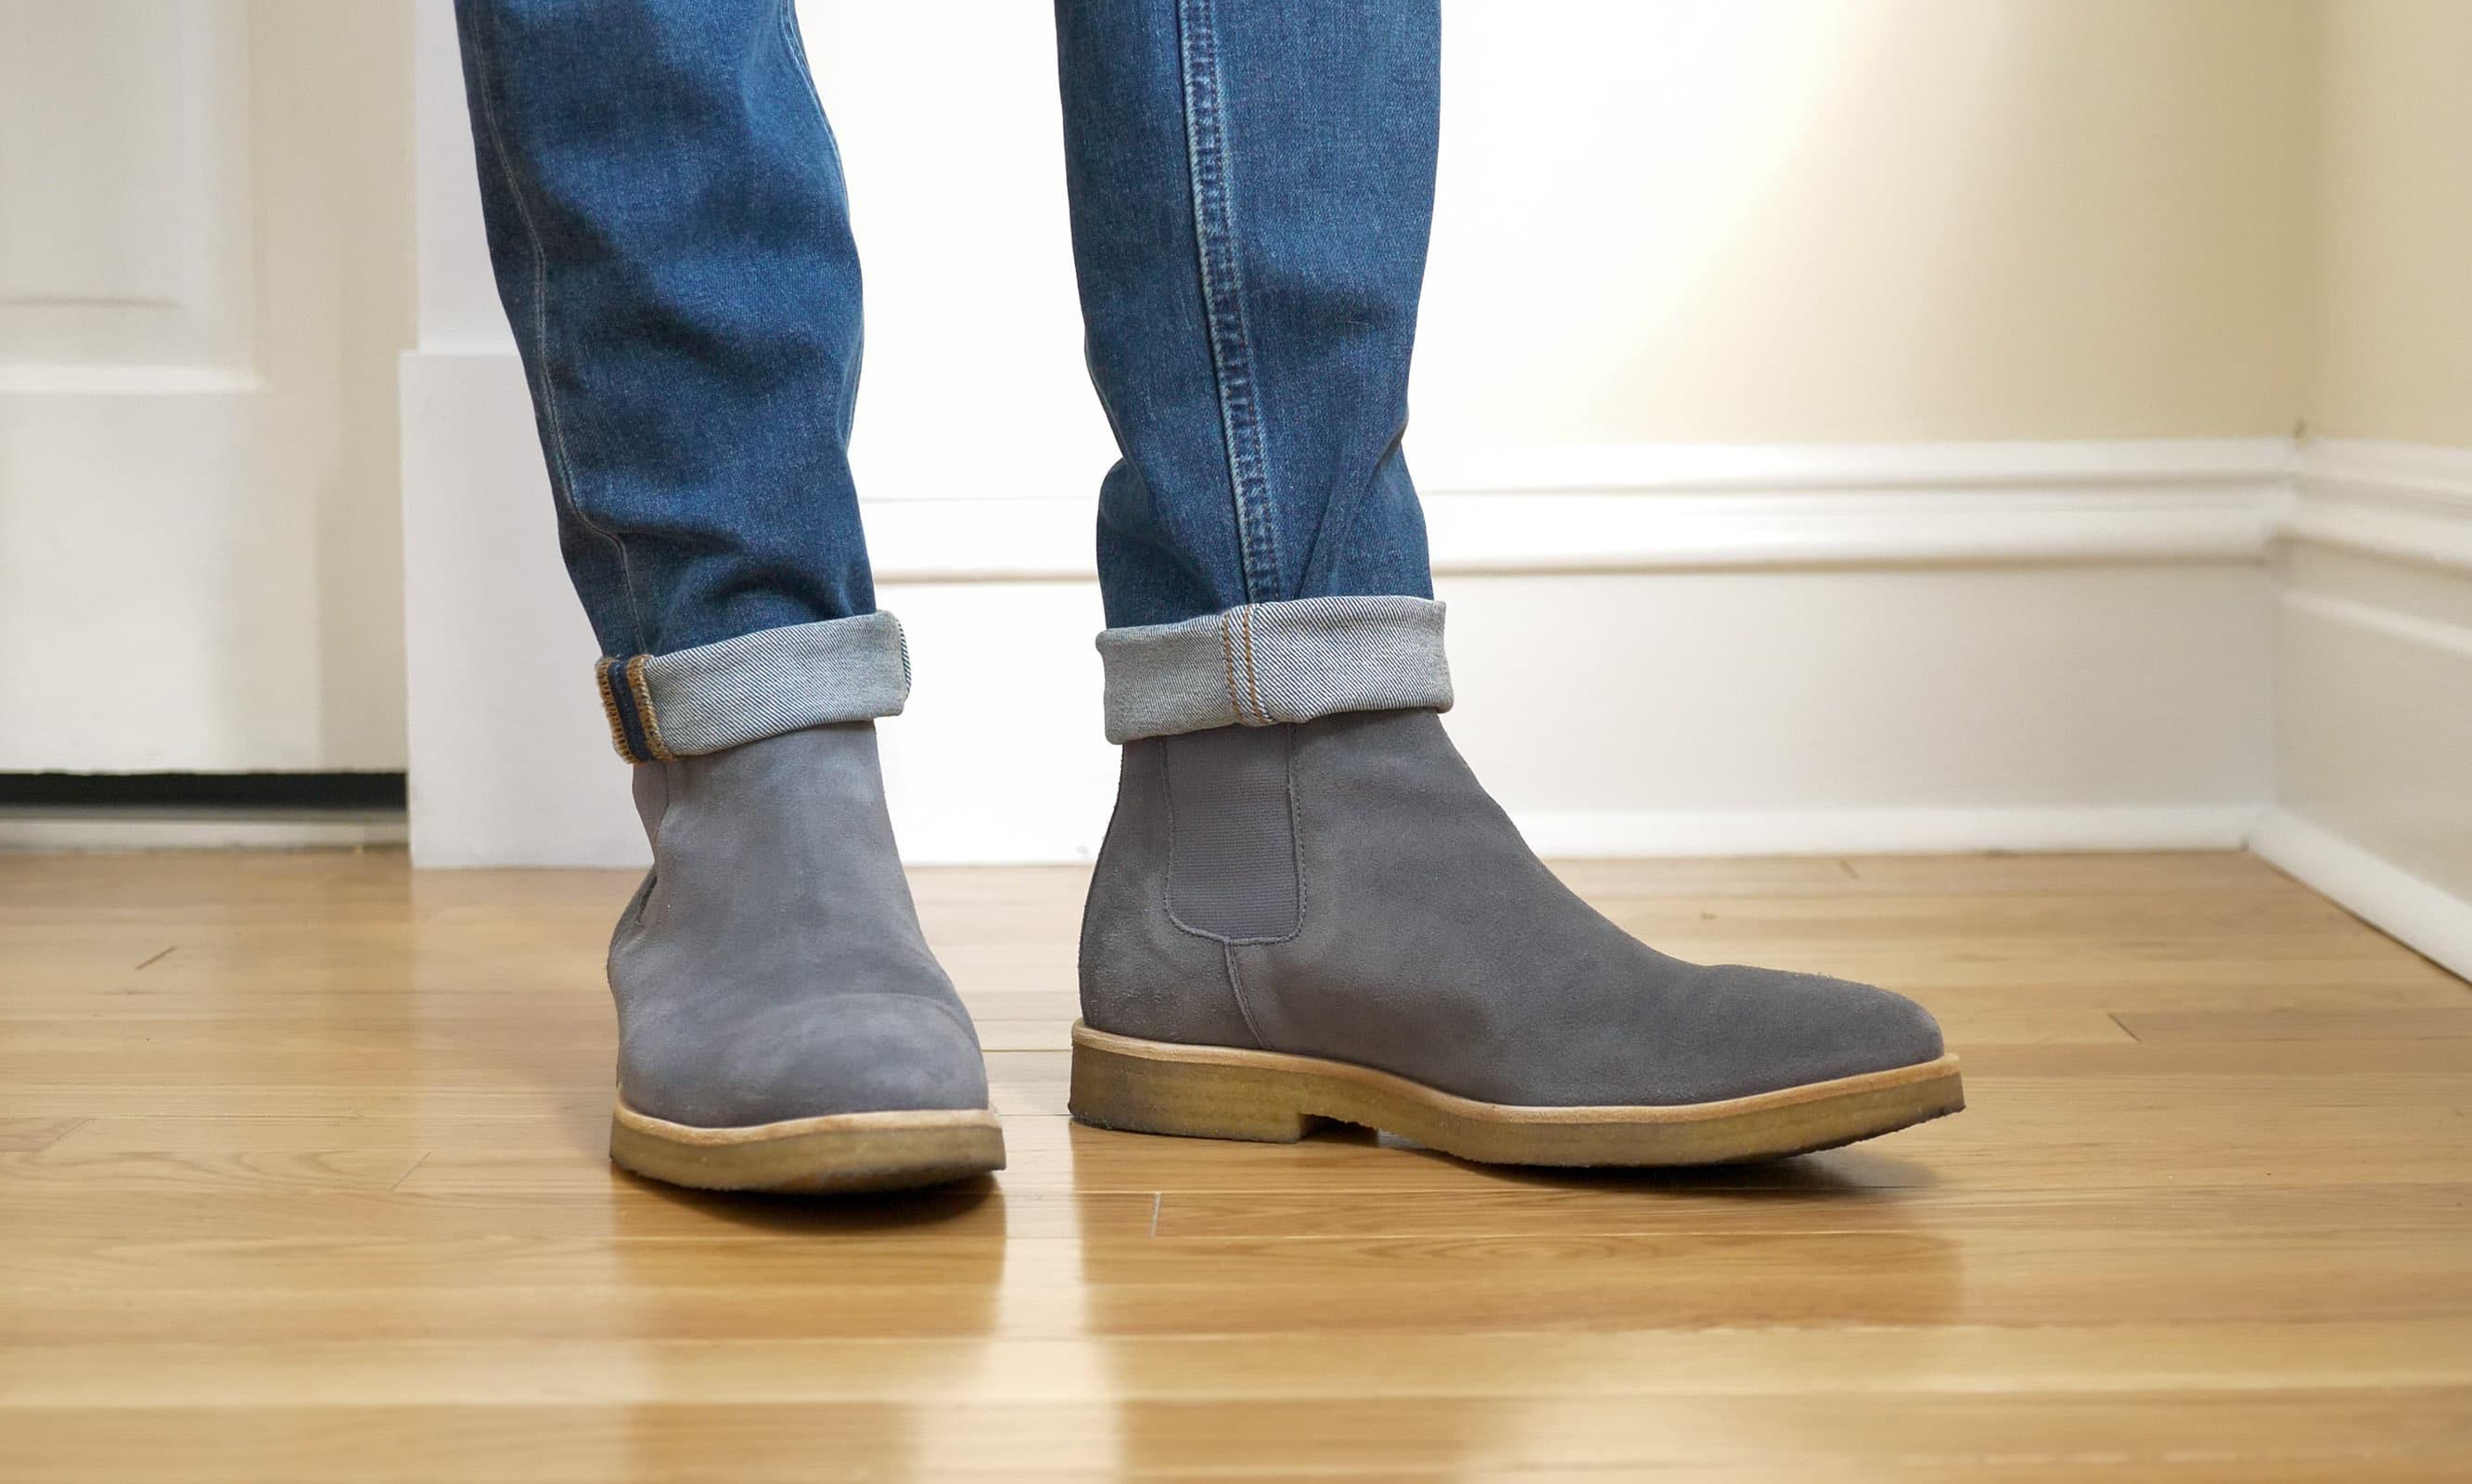 Oliver Cabell Chelseas on feet